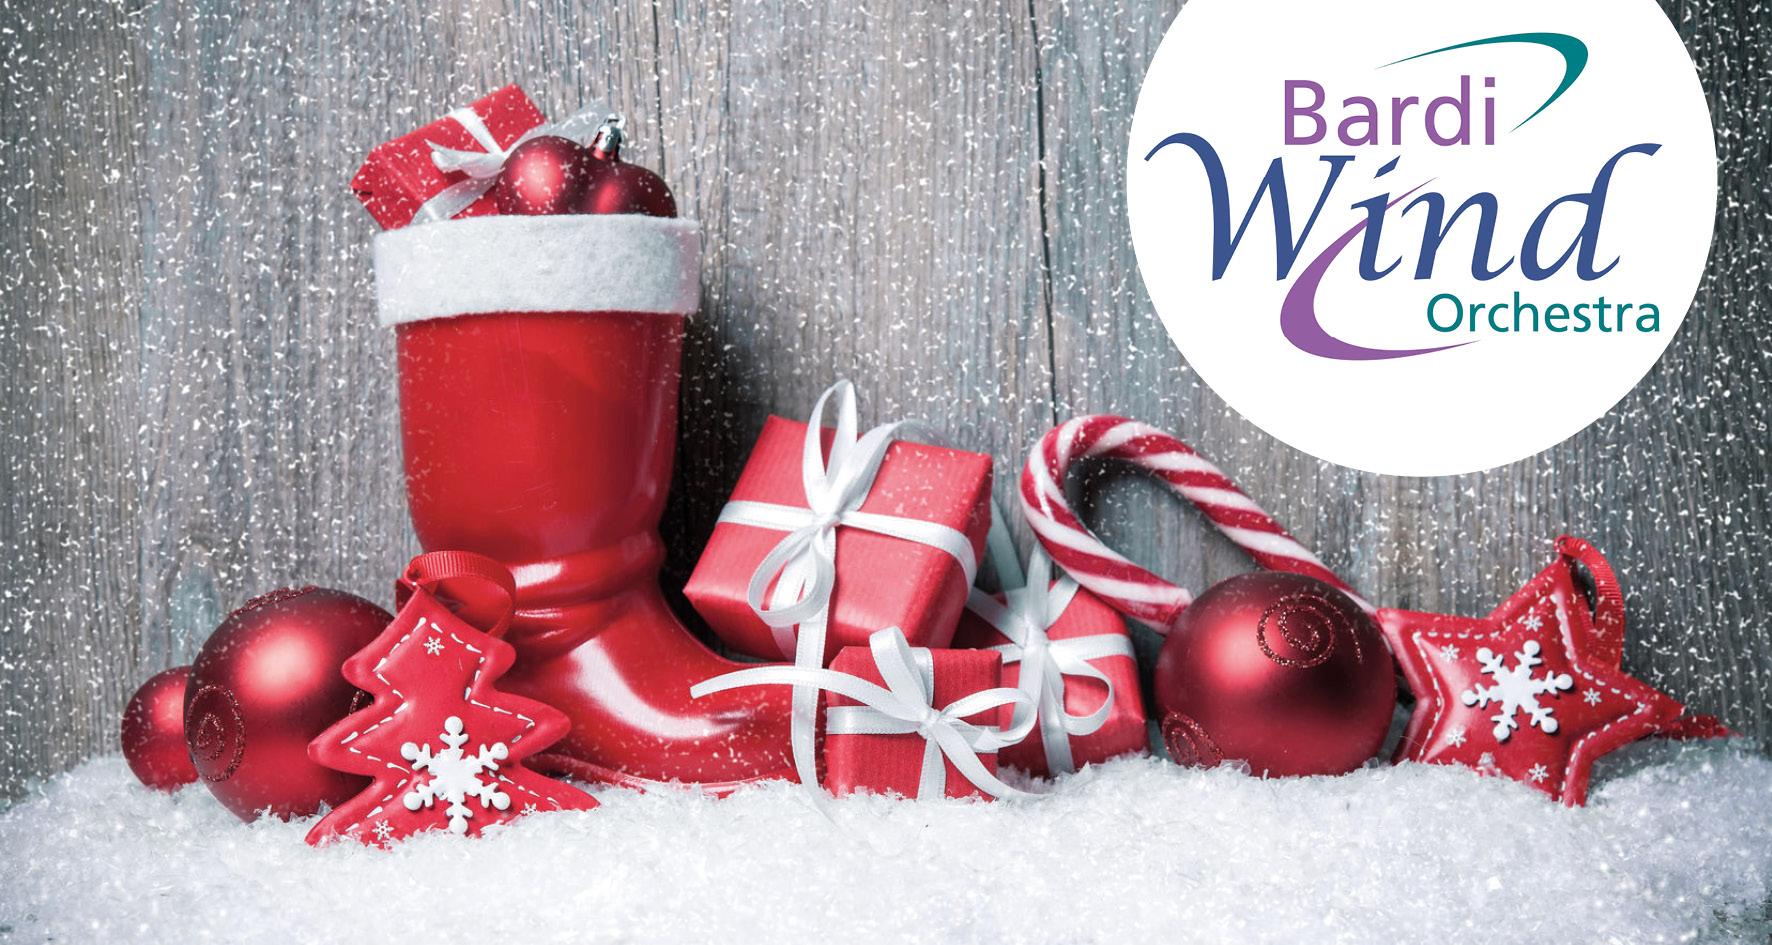 Bardi Wind Orchestra Christmas Festival Concert 2017